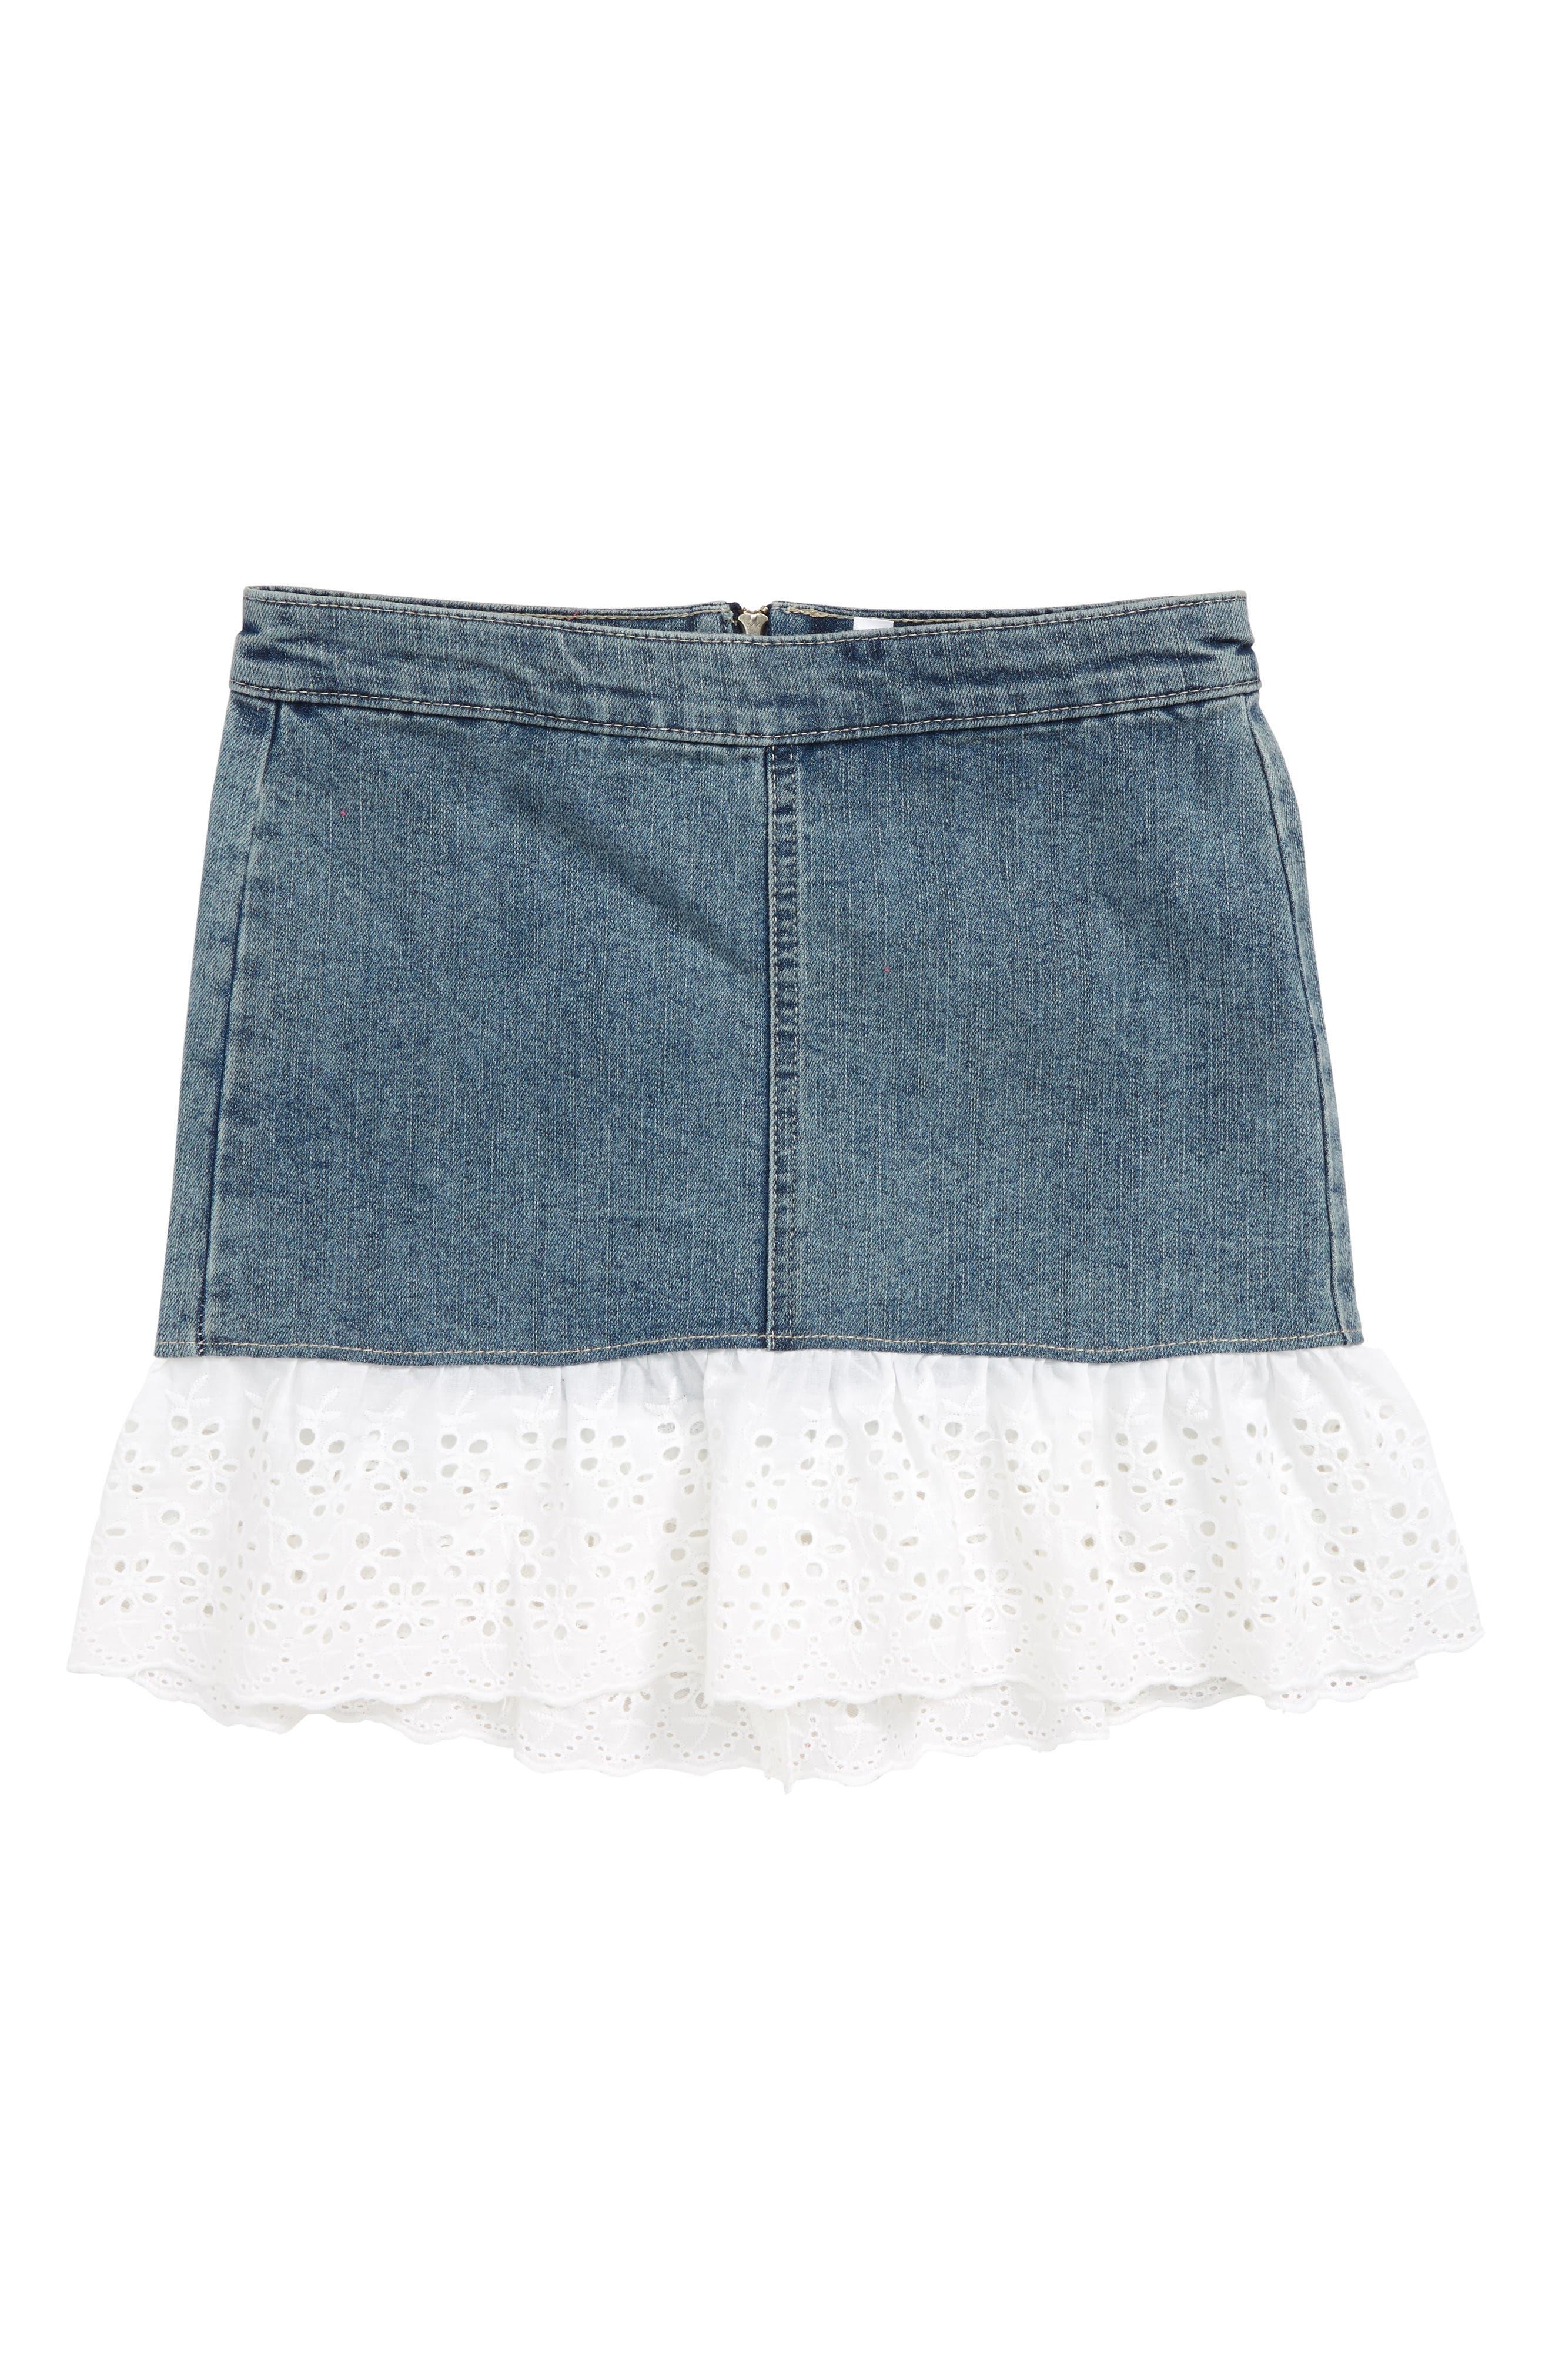 Denim Skirt,                             Main thumbnail 1, color,                             Marissa Wash